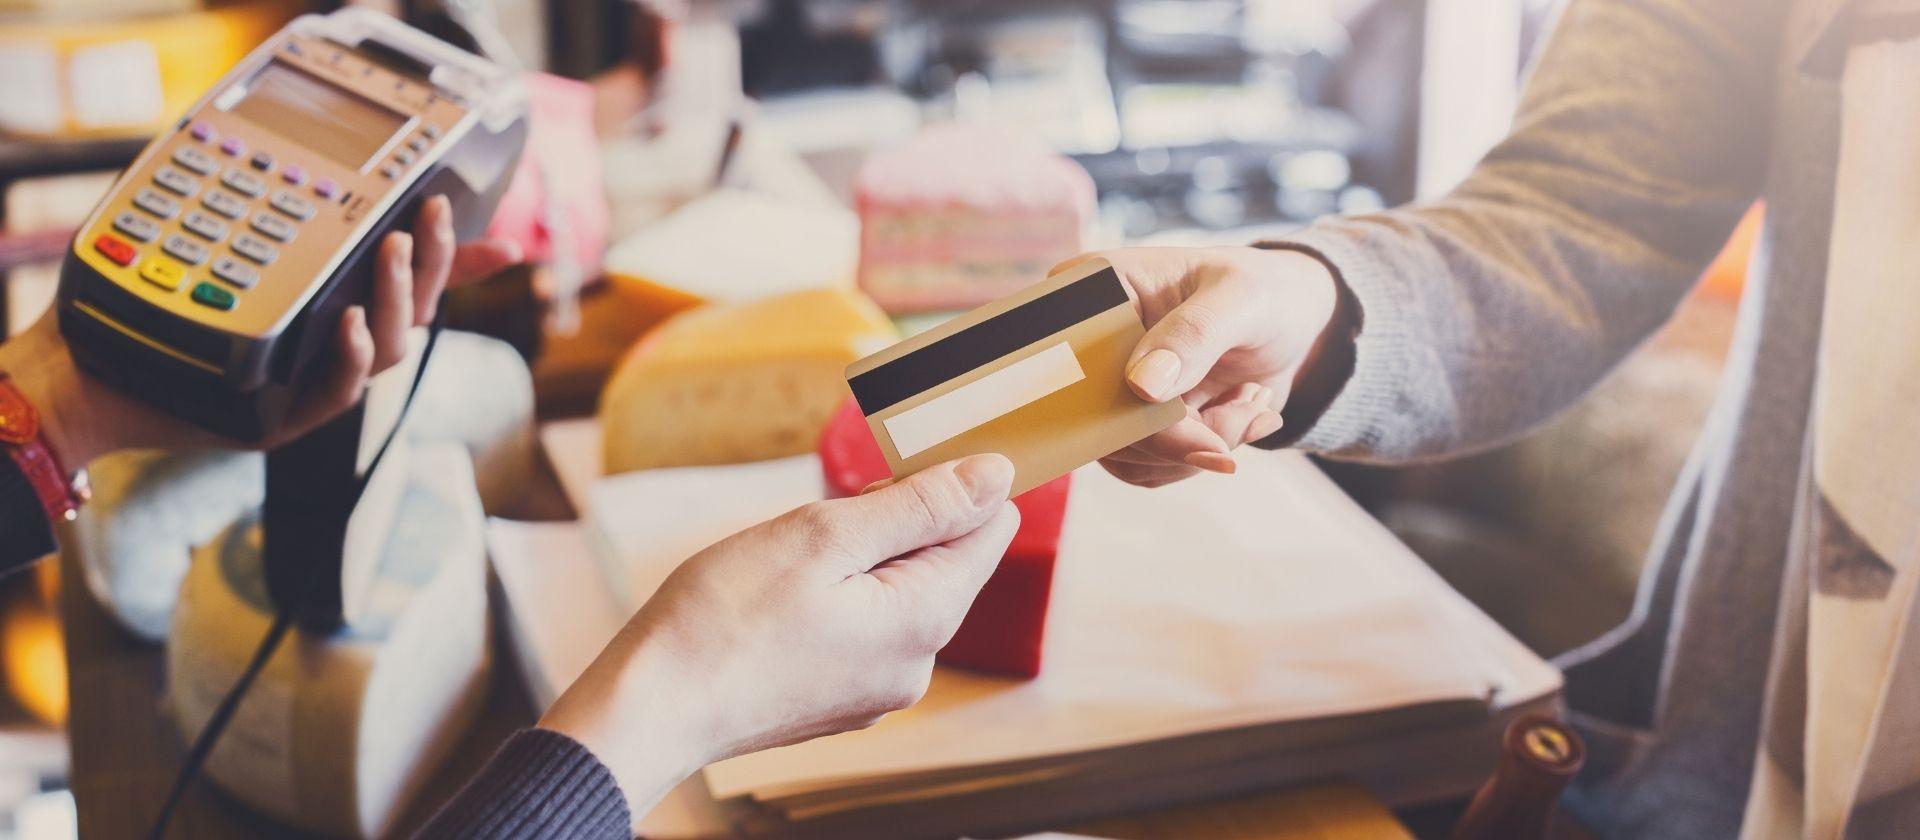 Optimizing the Value in Return Transactions